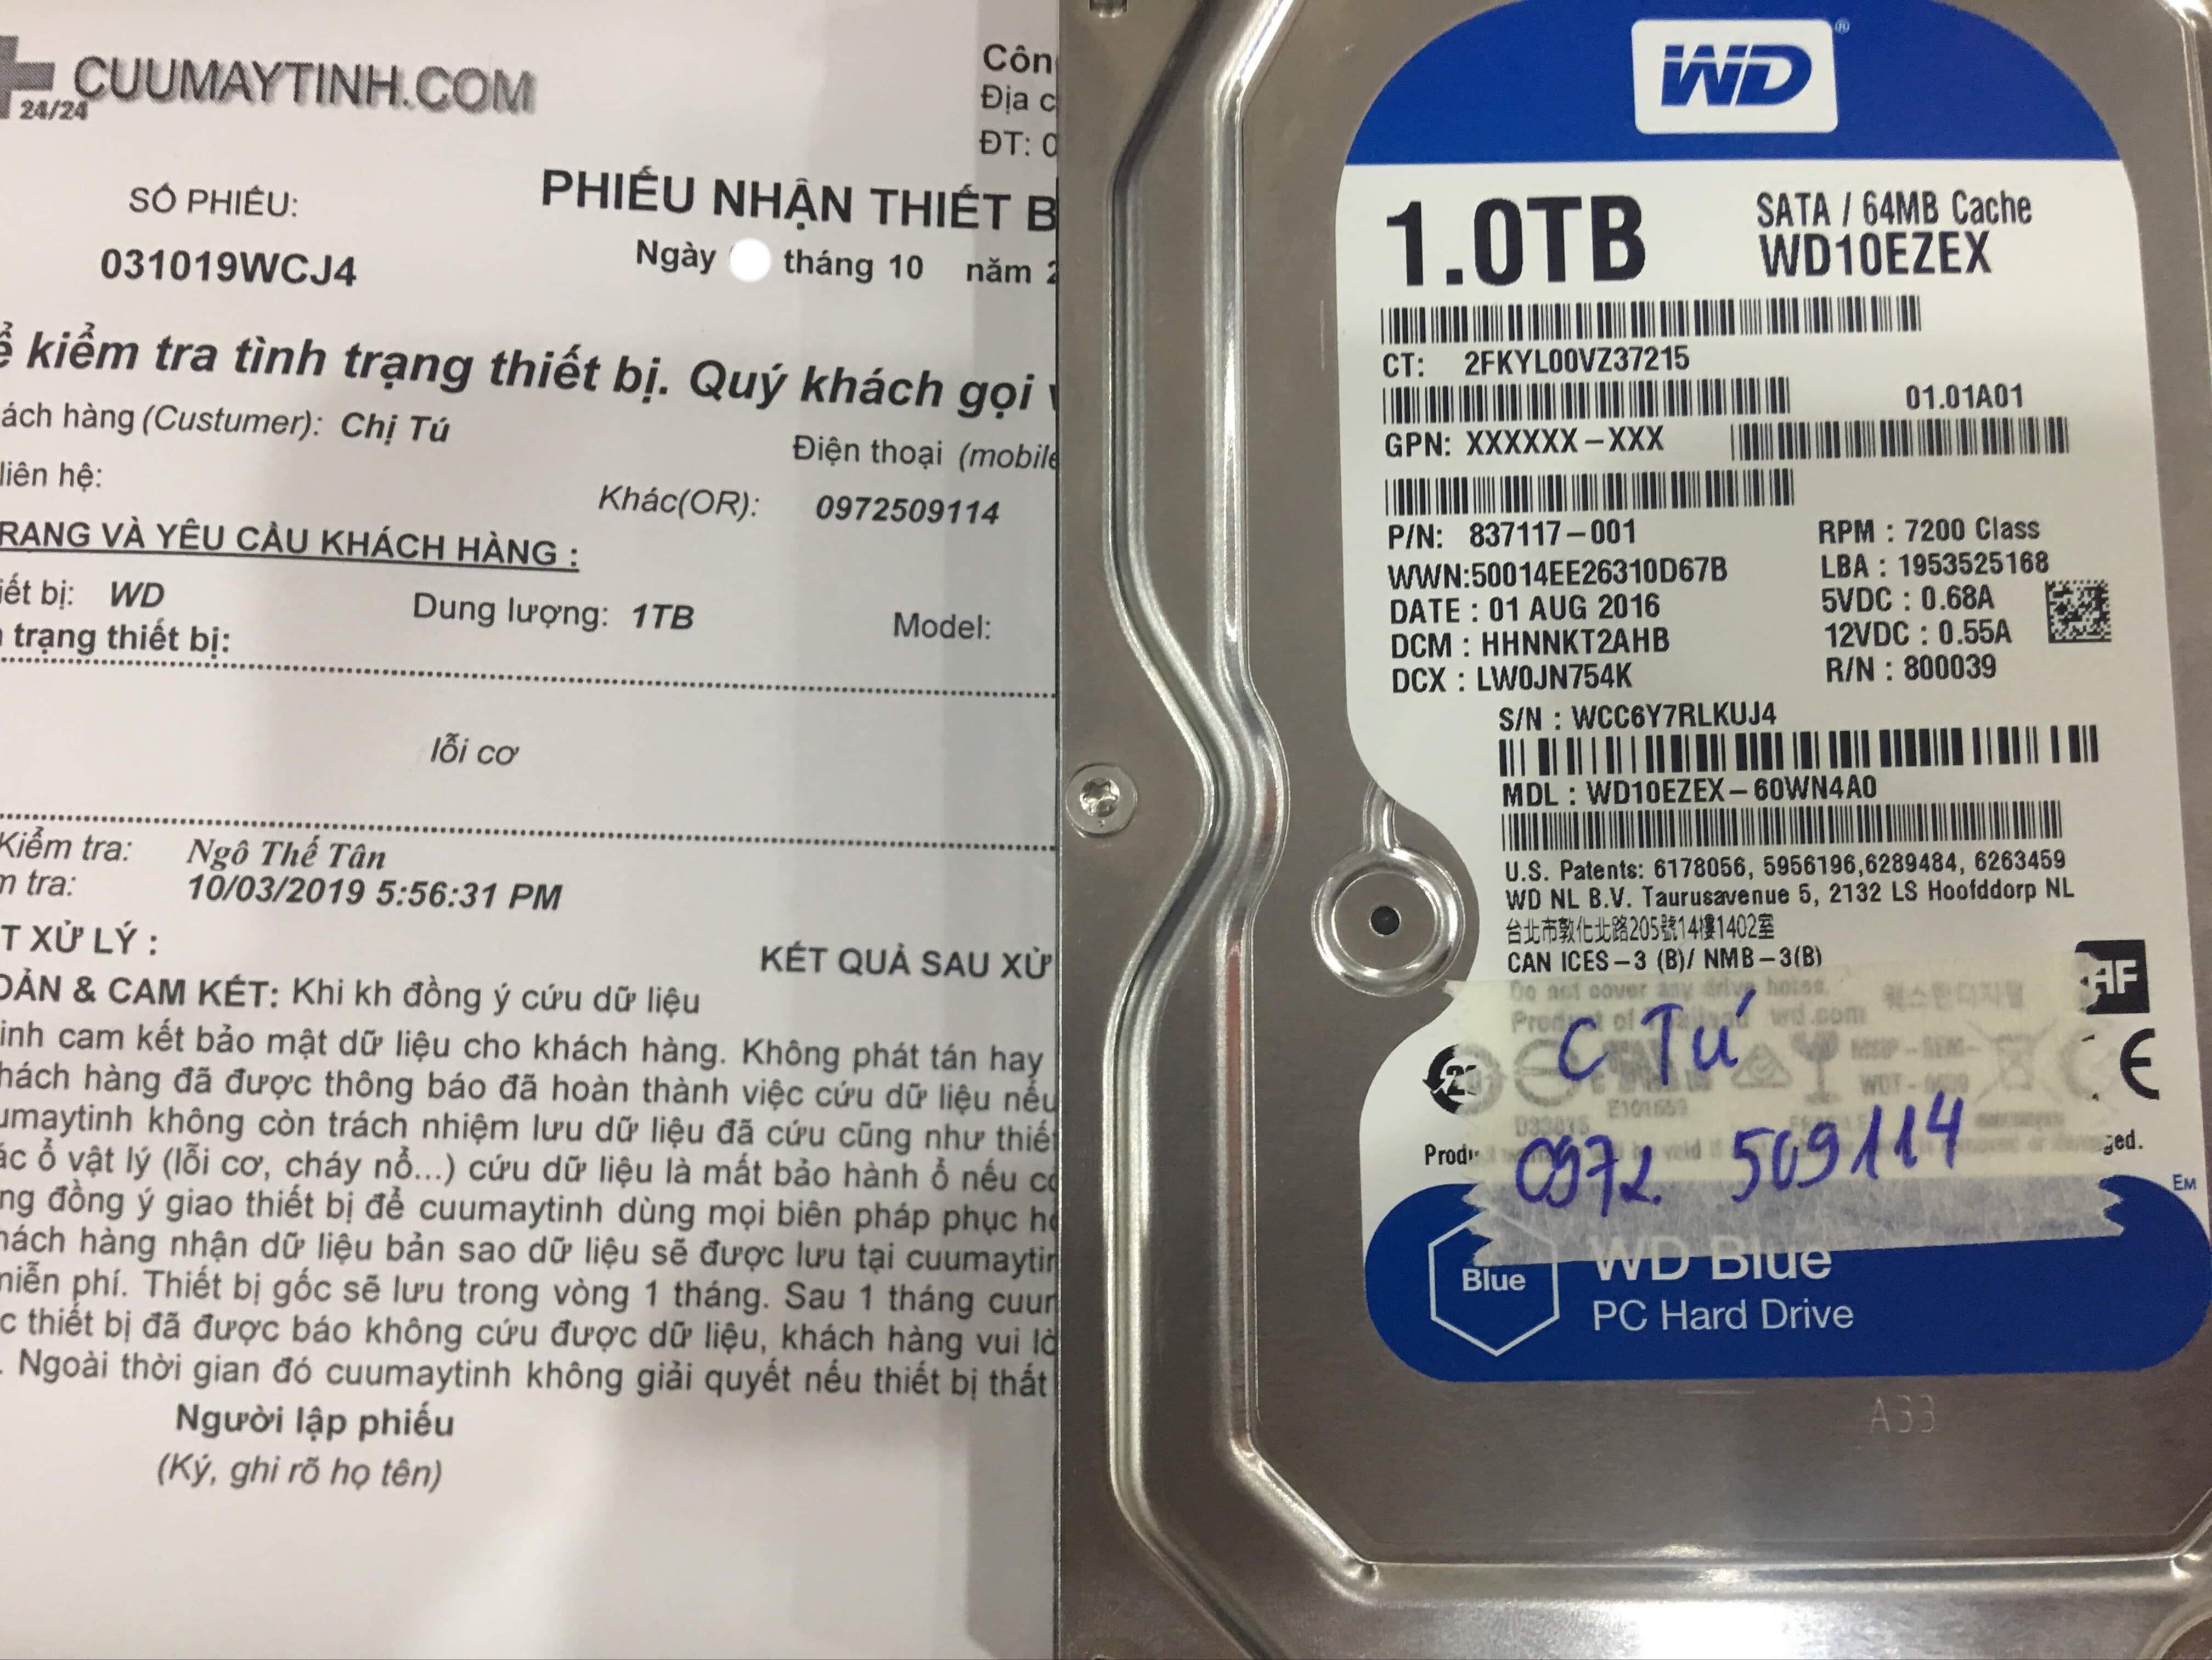 Phục hồi dữ liệu ổ cứng Western 1TB lỗi cơ 07/10/2019 - cuumaytinh